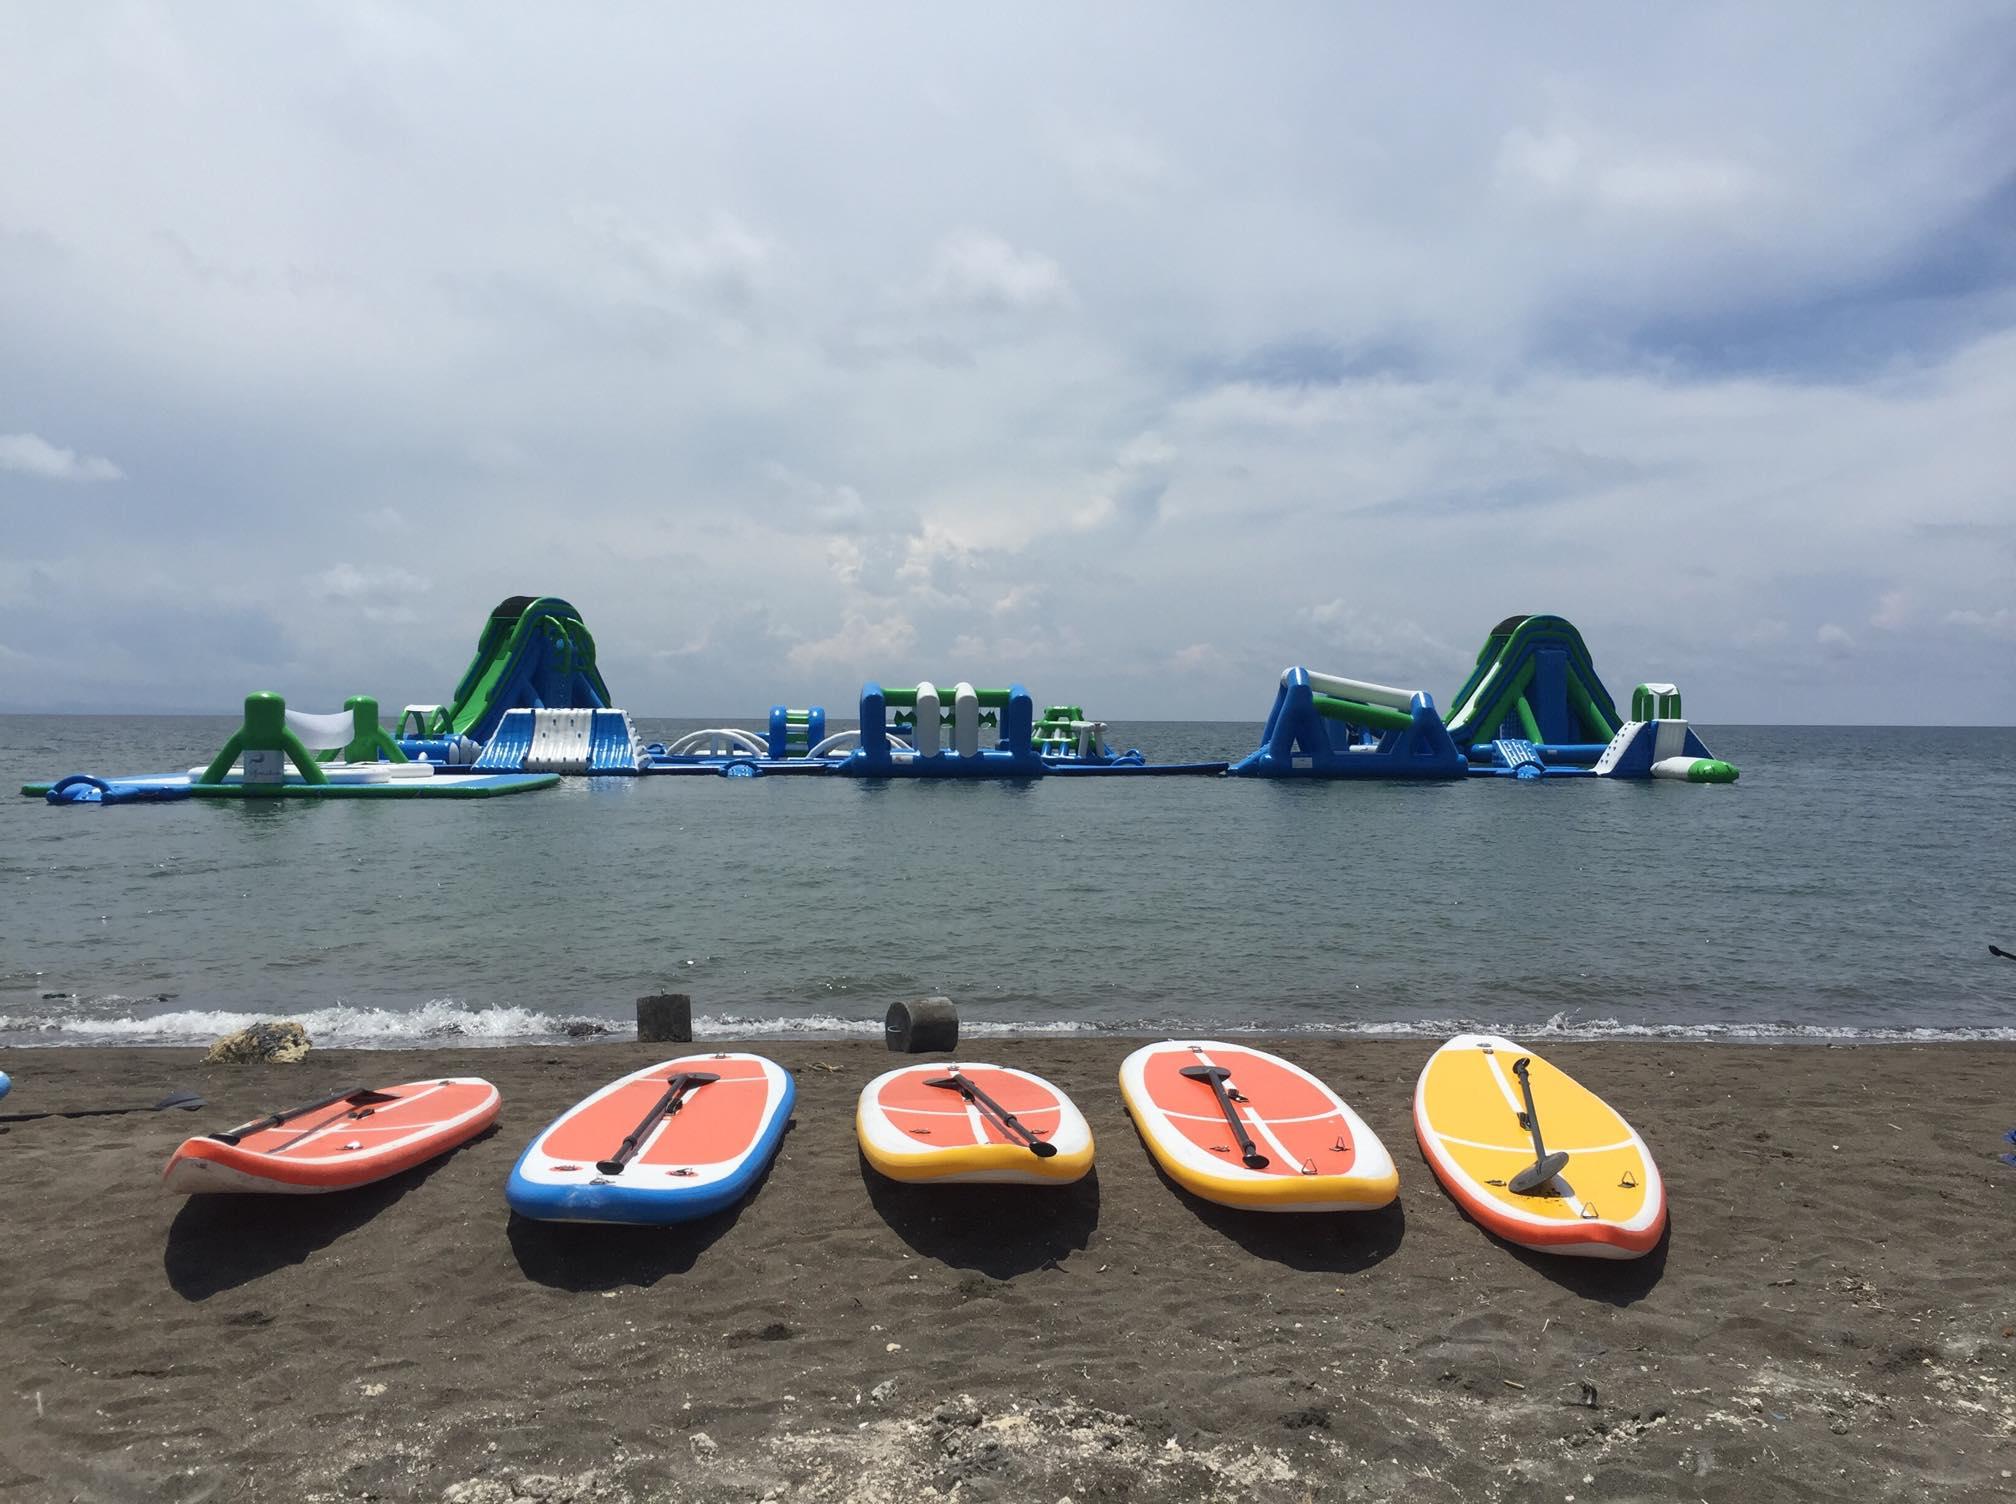 Aqua Play Inflatable Adventure